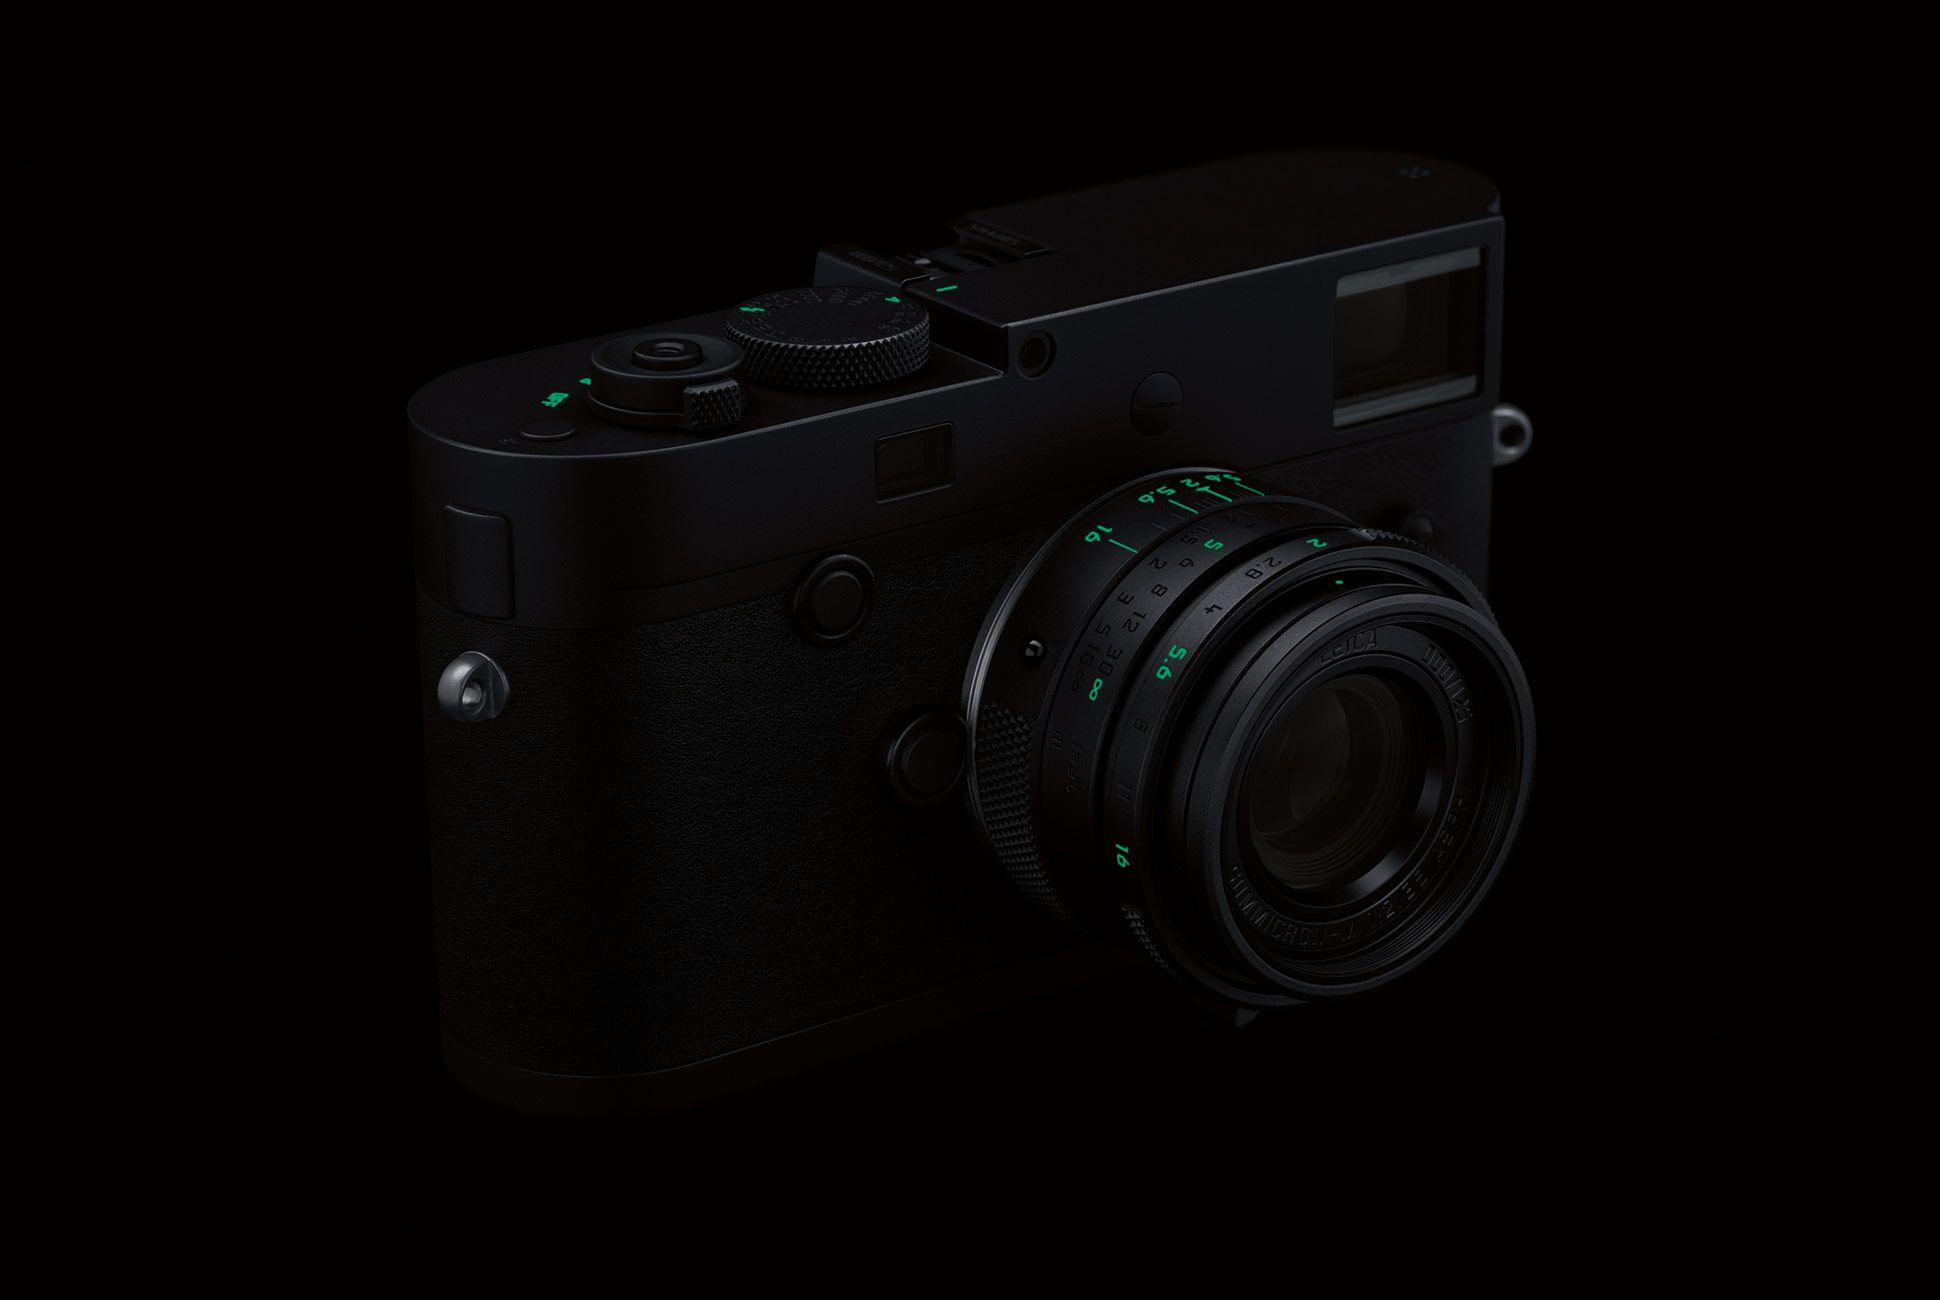 Leica-M-Stealth-Gear-Patrol-Slide-3